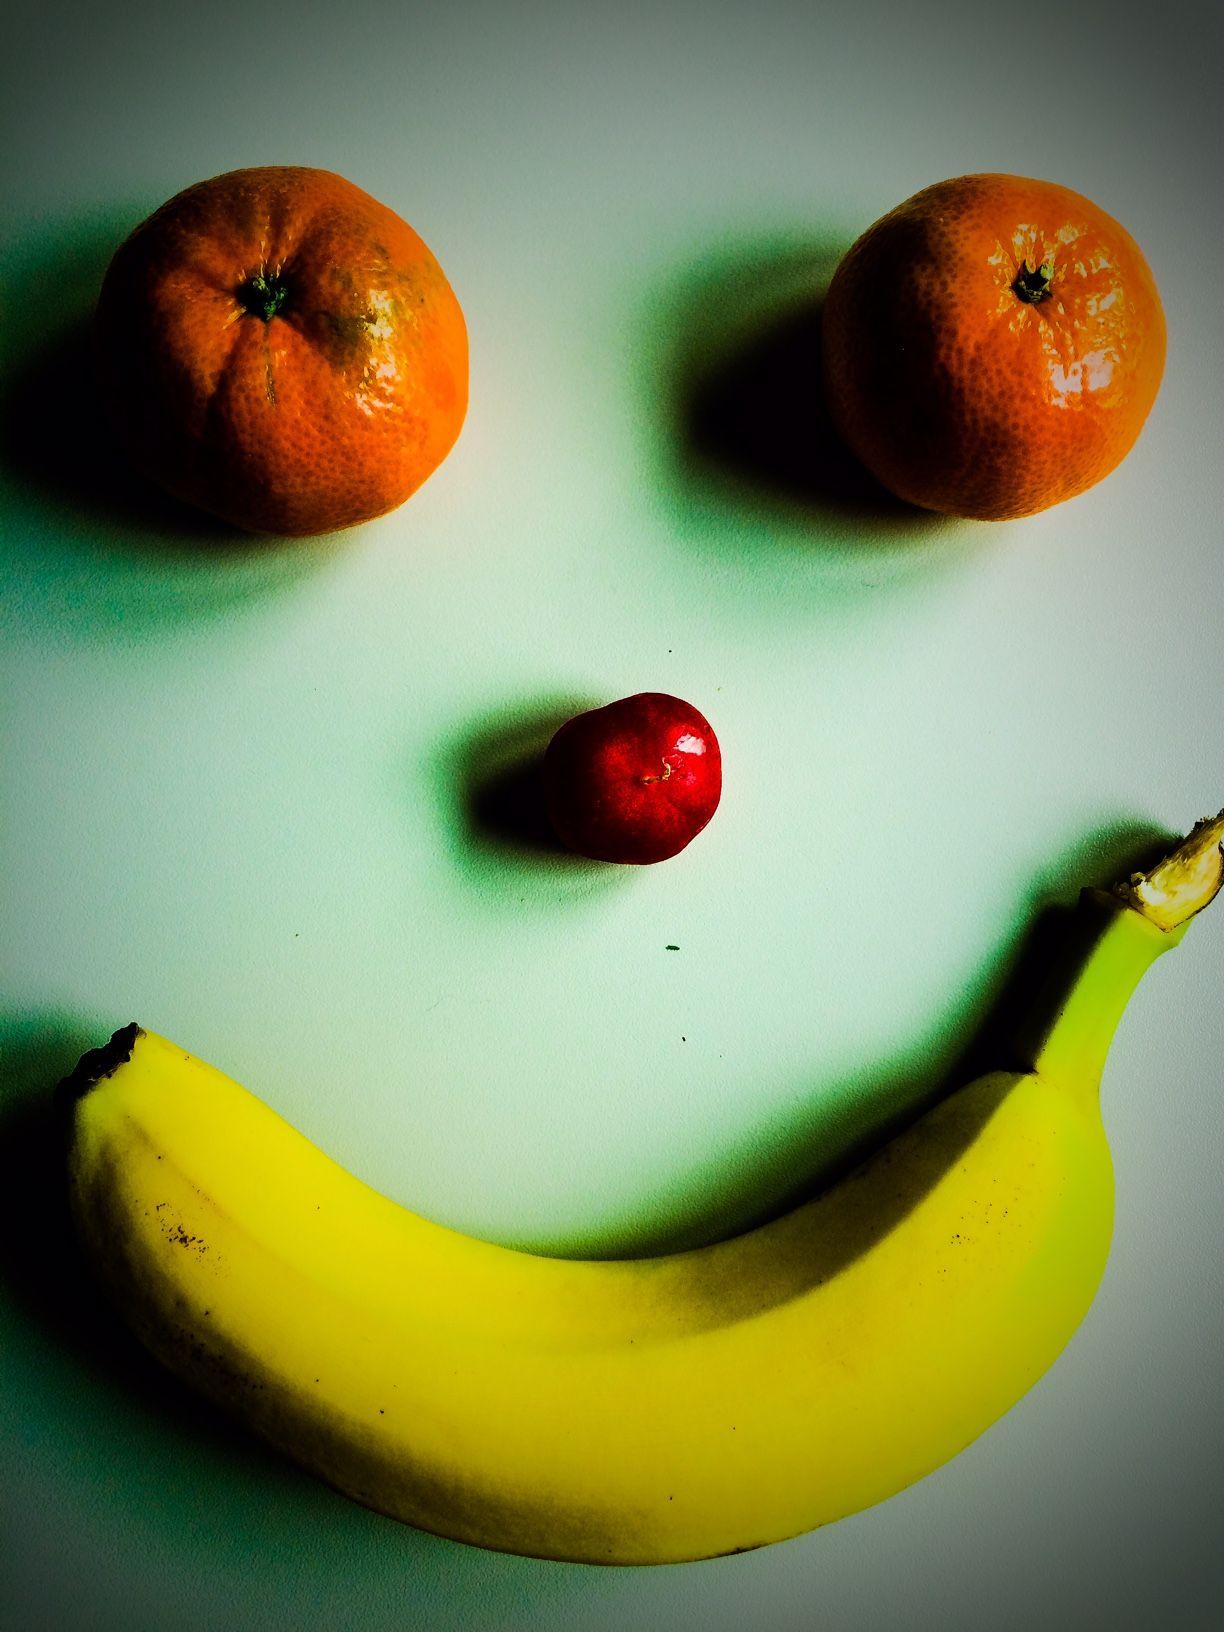 Smiling banana, looking good through those madarin eyes. Nosey radish nonetheless.